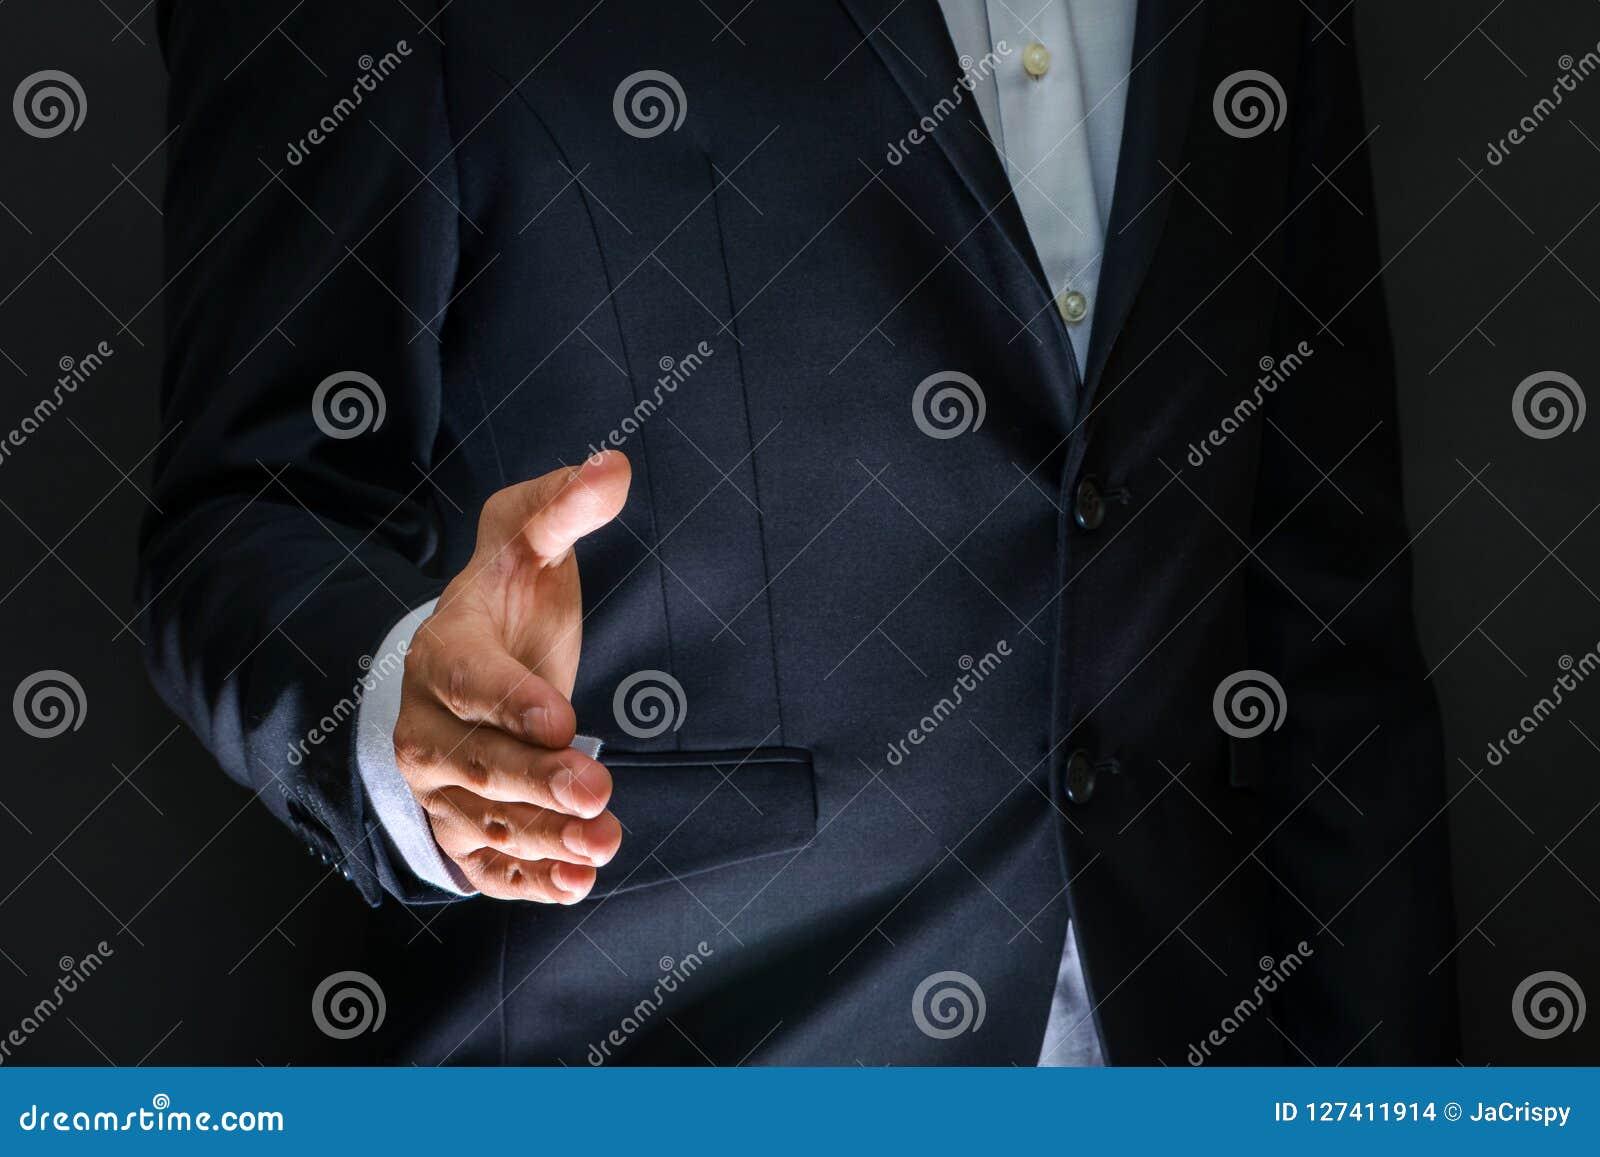 Business partnership meeting concept. Businessman handshake. Successful businessmen handshaking after good deal. Horizontal, blur